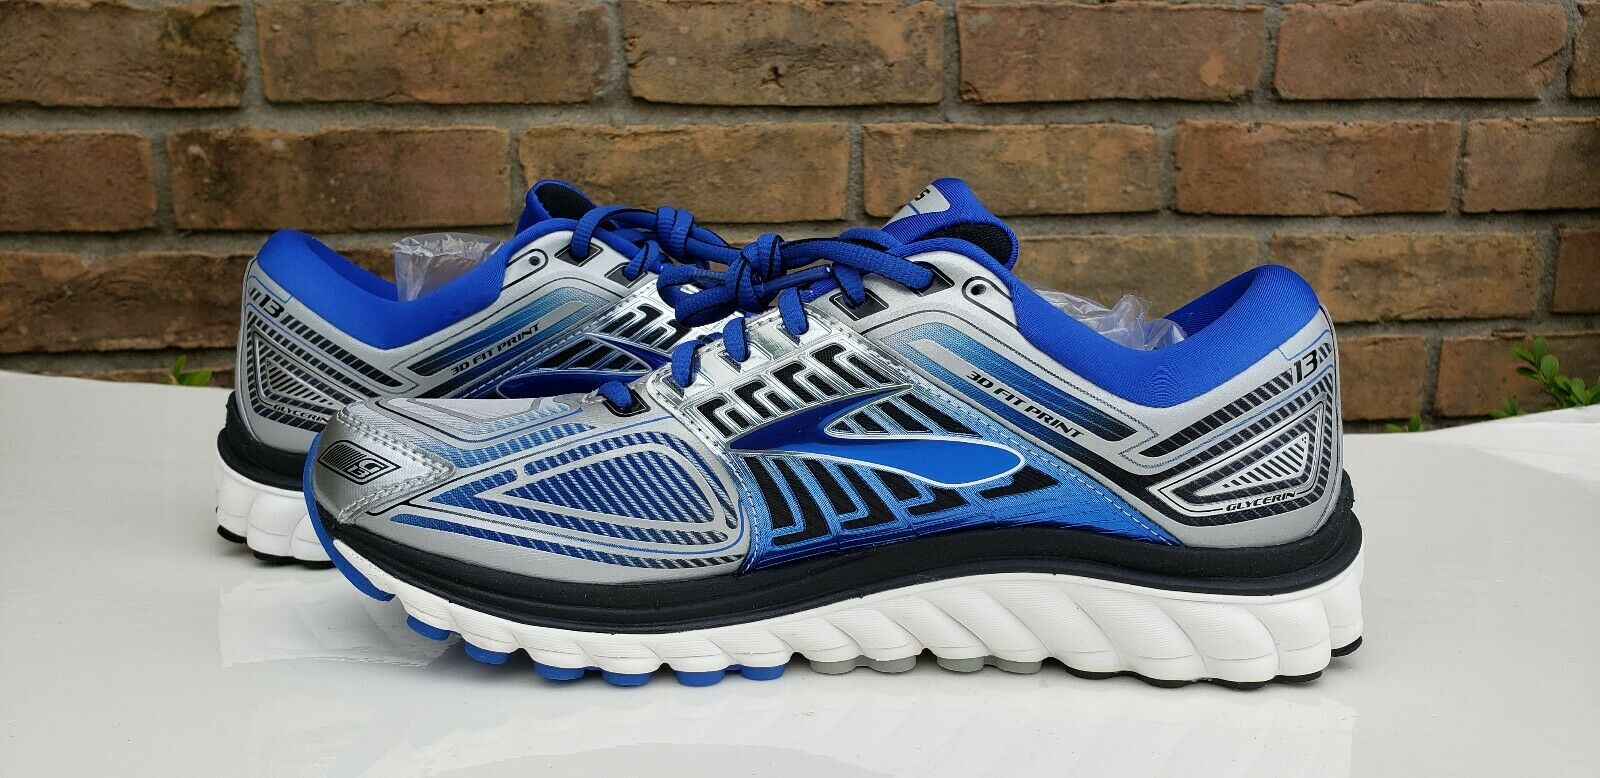 NEW BROOKS GLYCERIN 13 MENS RUNNING schuhe 110199 1D 095 Größe 10 Blau